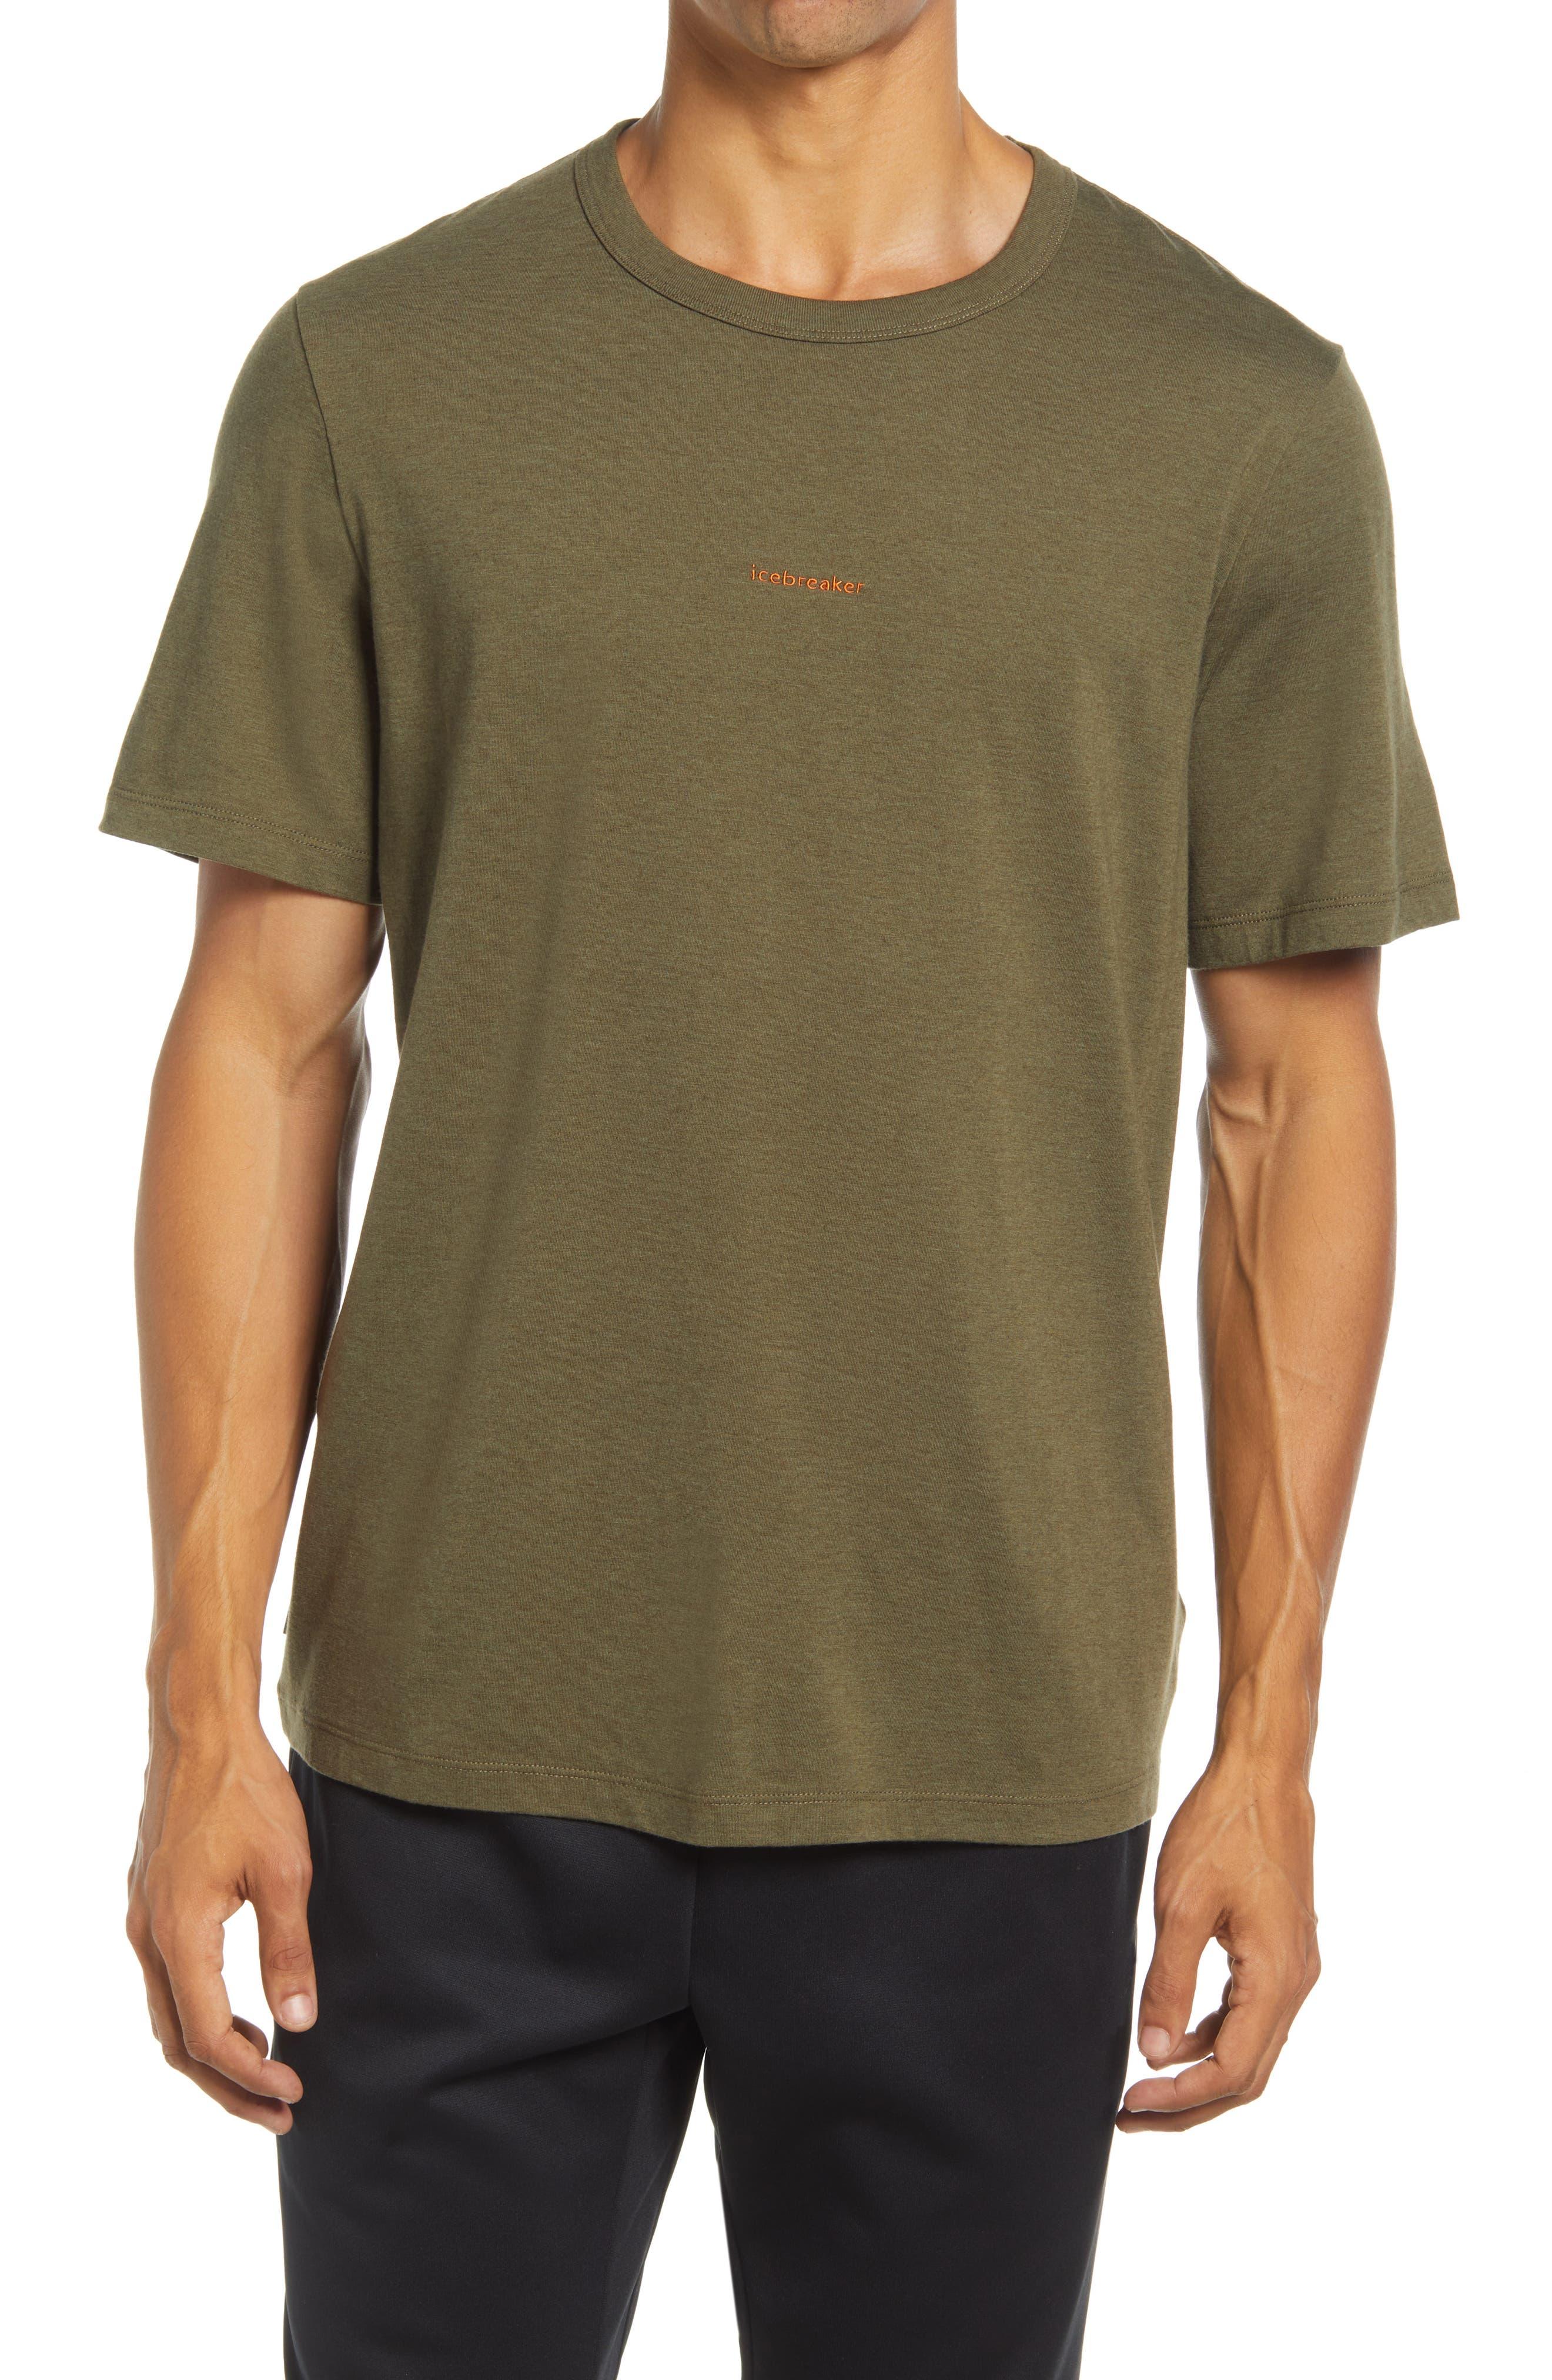 Central Merino Wool & Organic Cotton T-Shirt